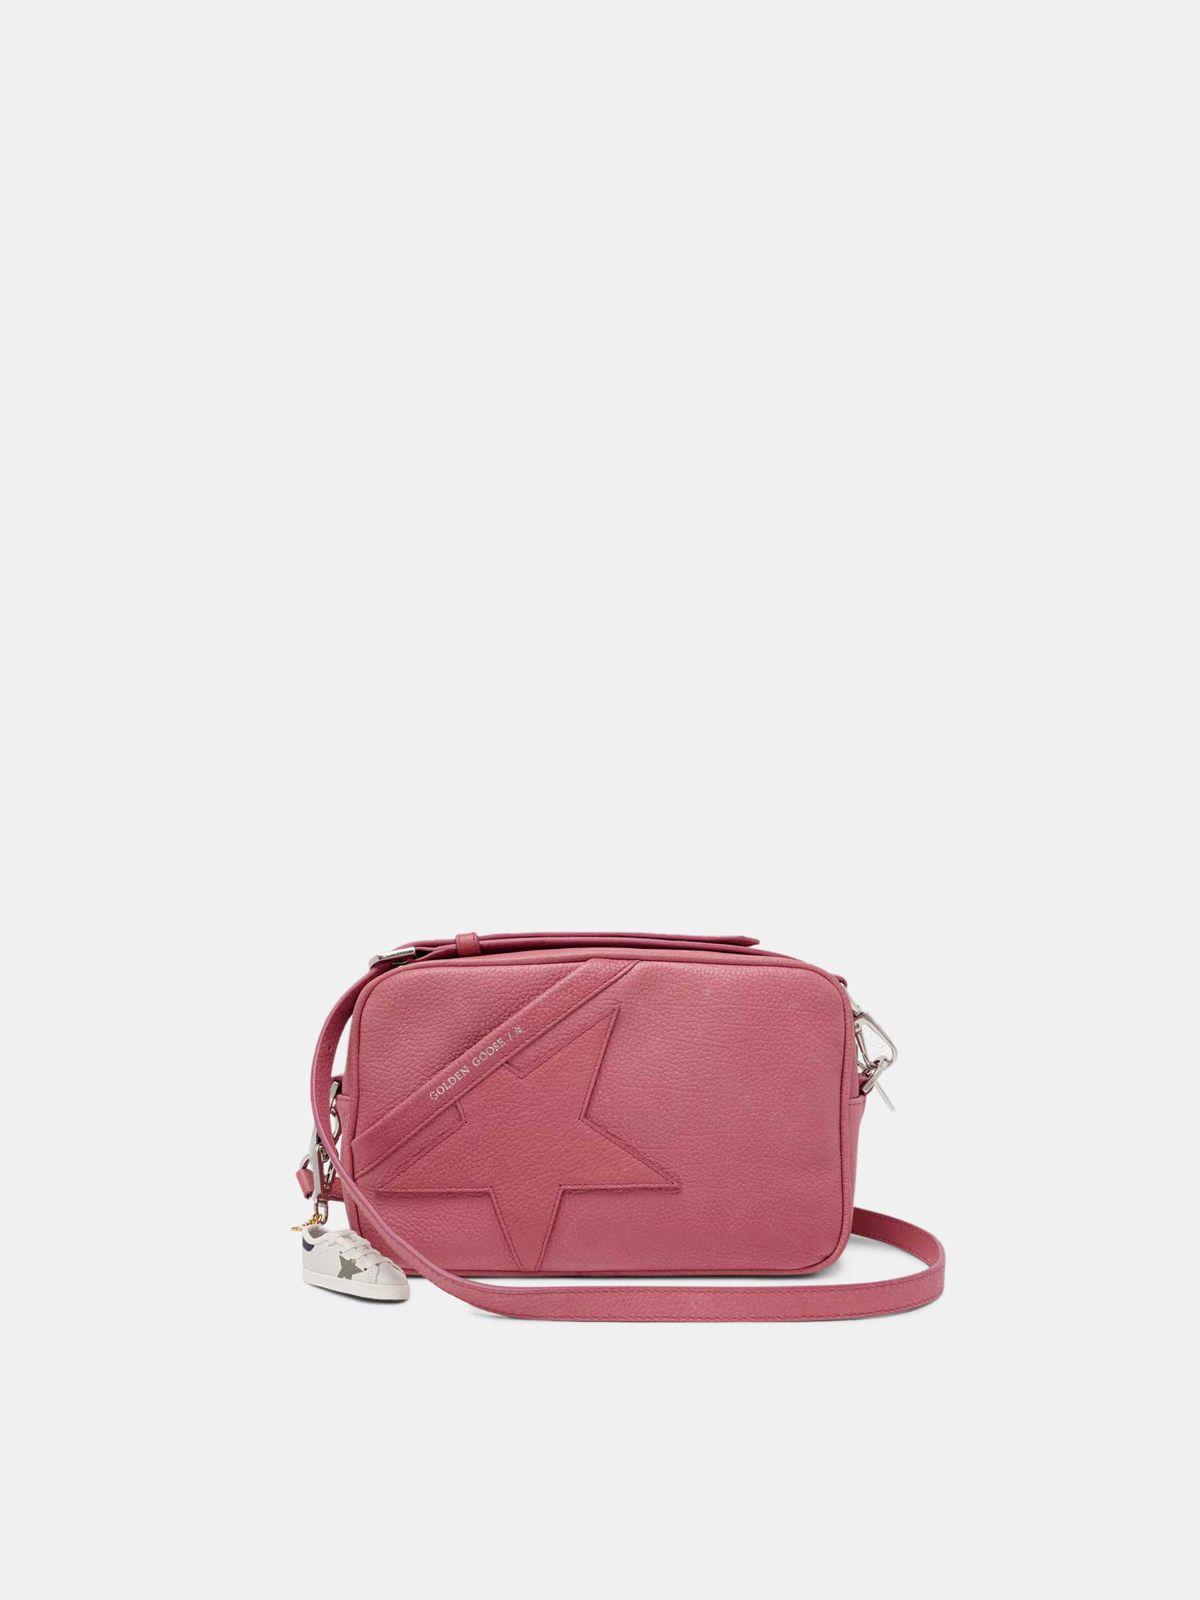 Golden Goose - Borsa Star Bag rosa a tracolla in pelle granata in